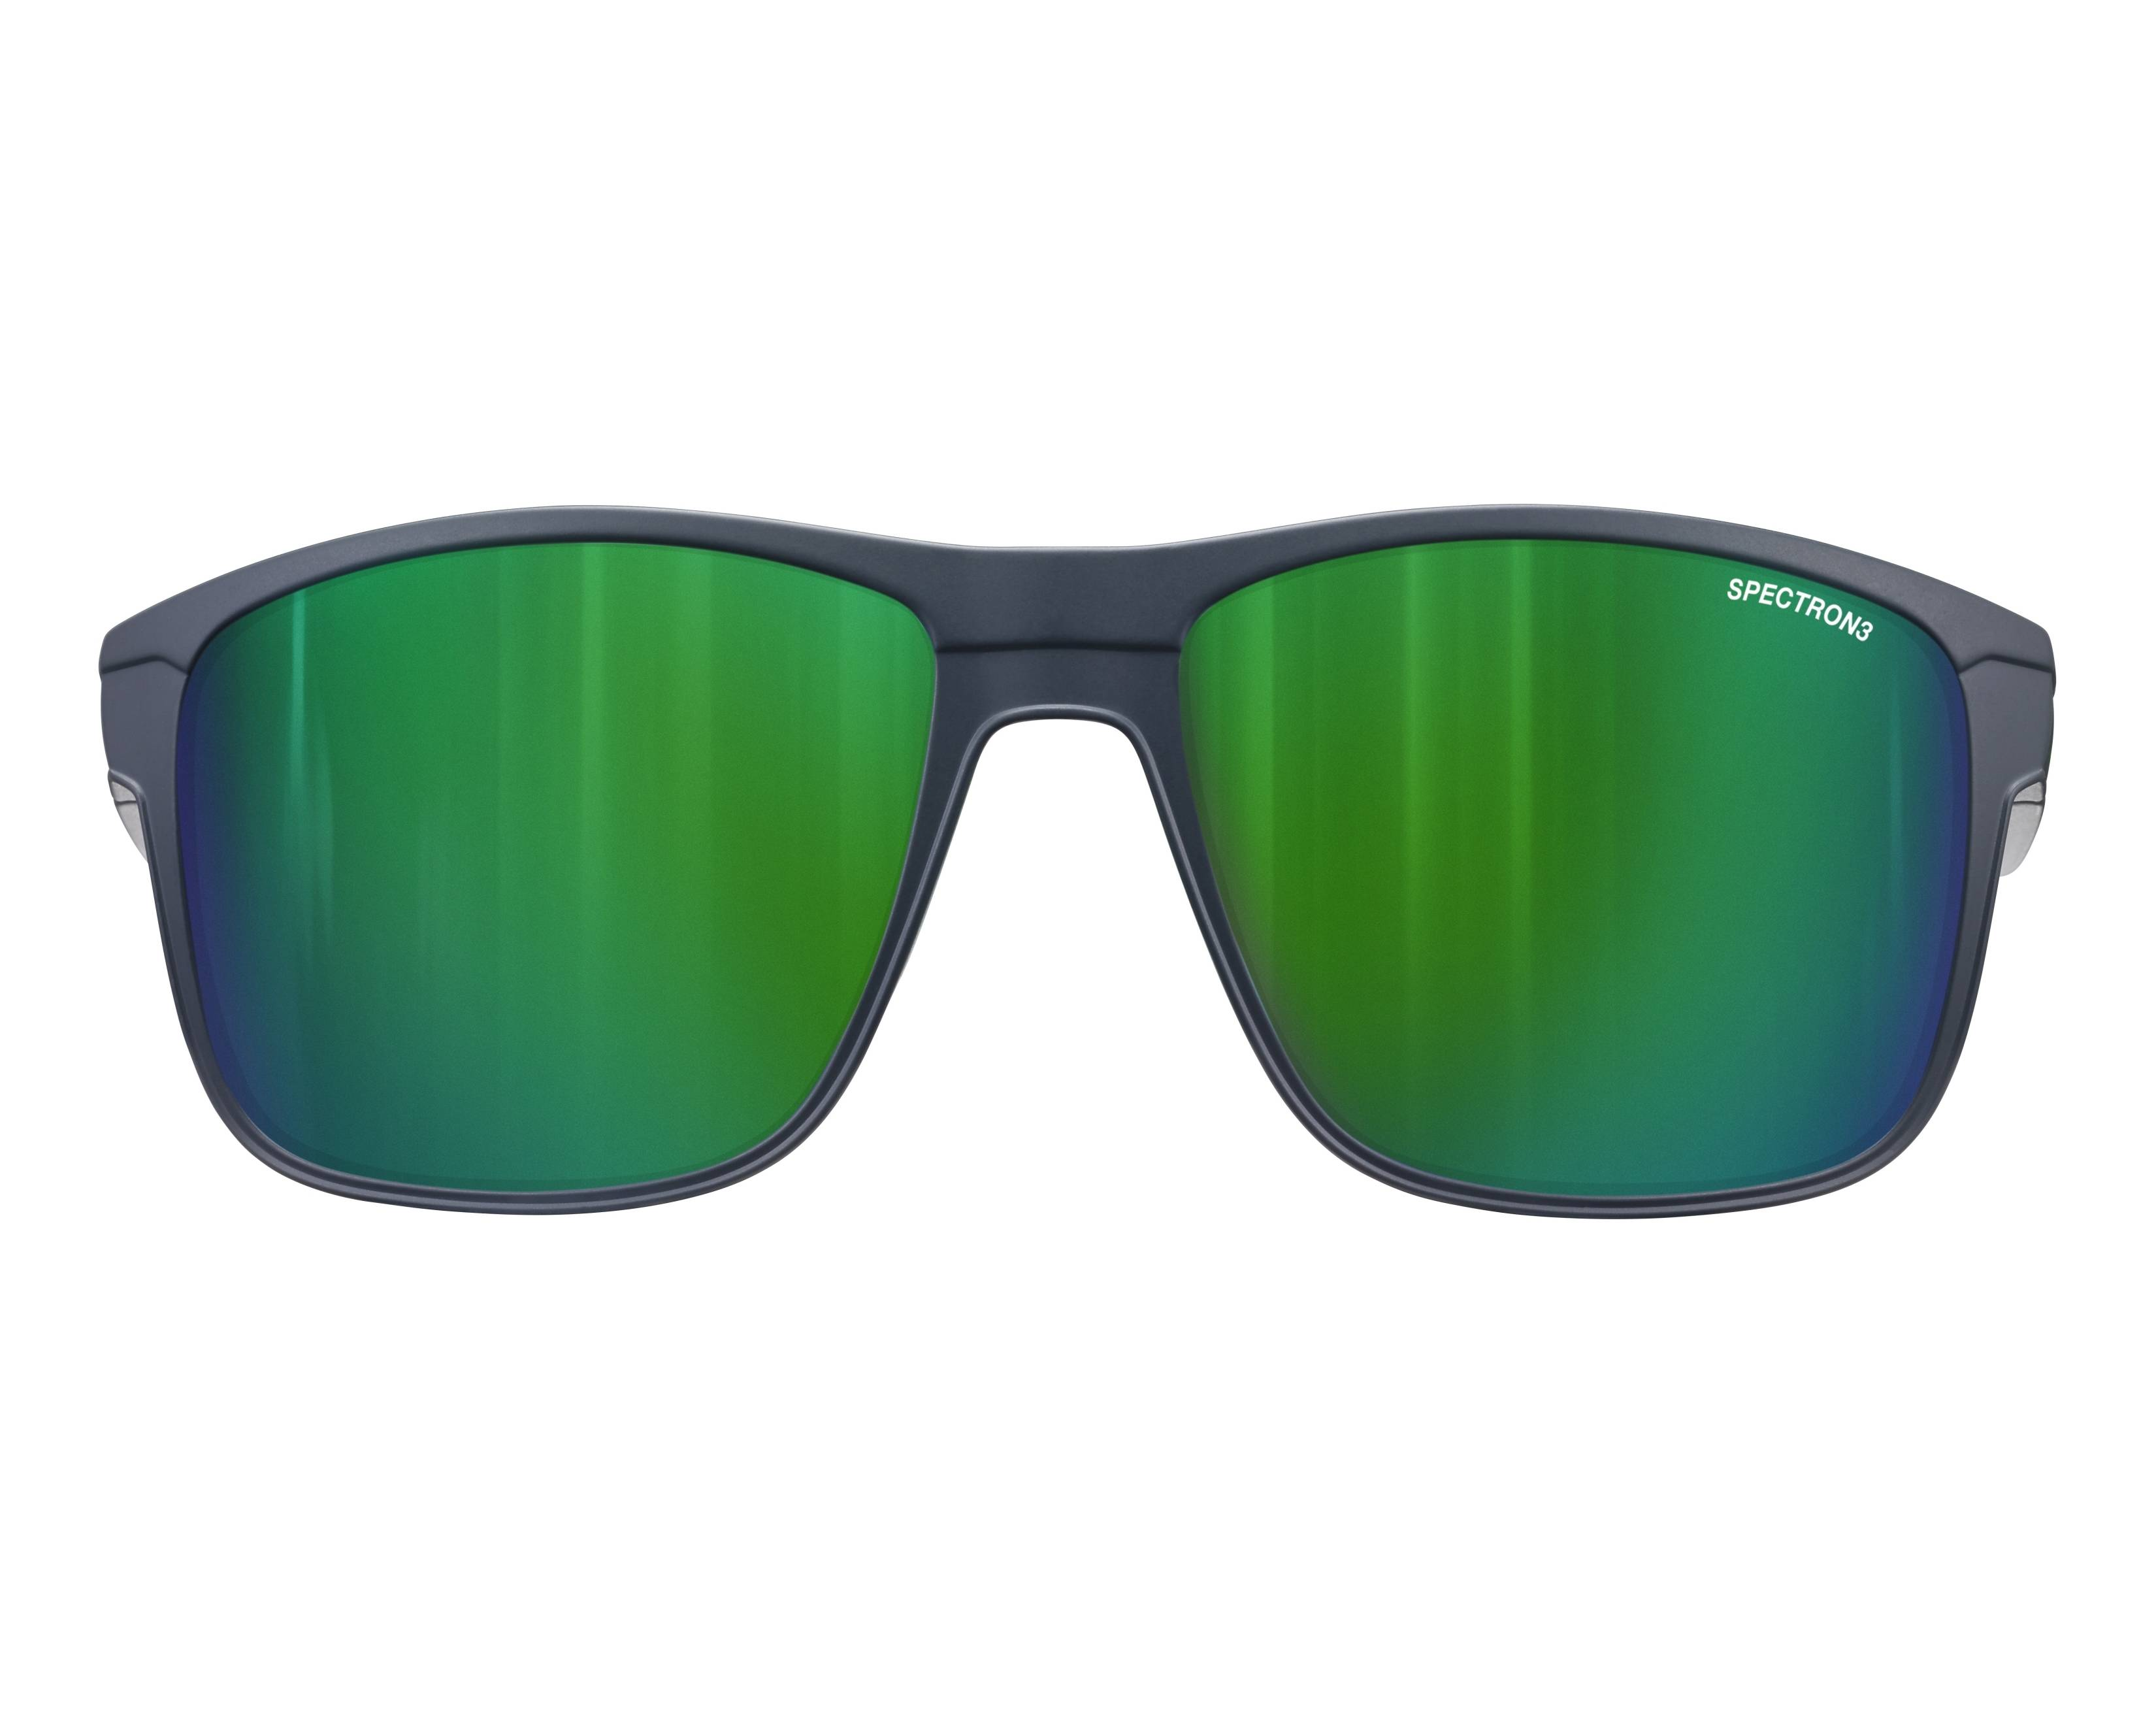 lunettes de soleil julbo j499 1112 bleu avec des verres gris. Black Bedroom Furniture Sets. Home Design Ideas